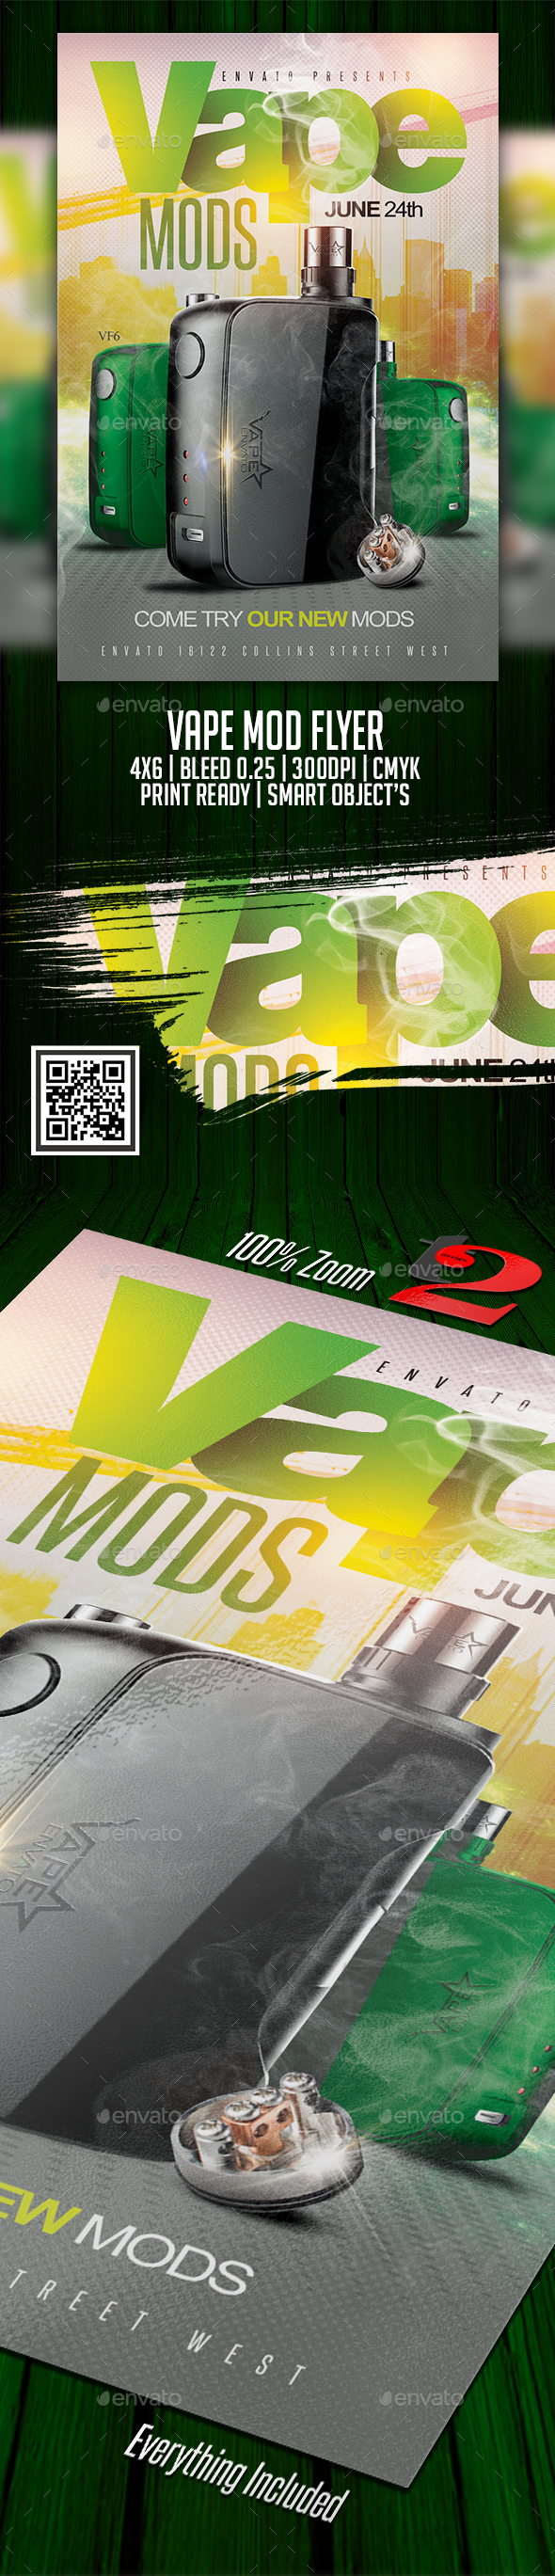 Vape Mods Flyer Template - Clubs & Parties Events